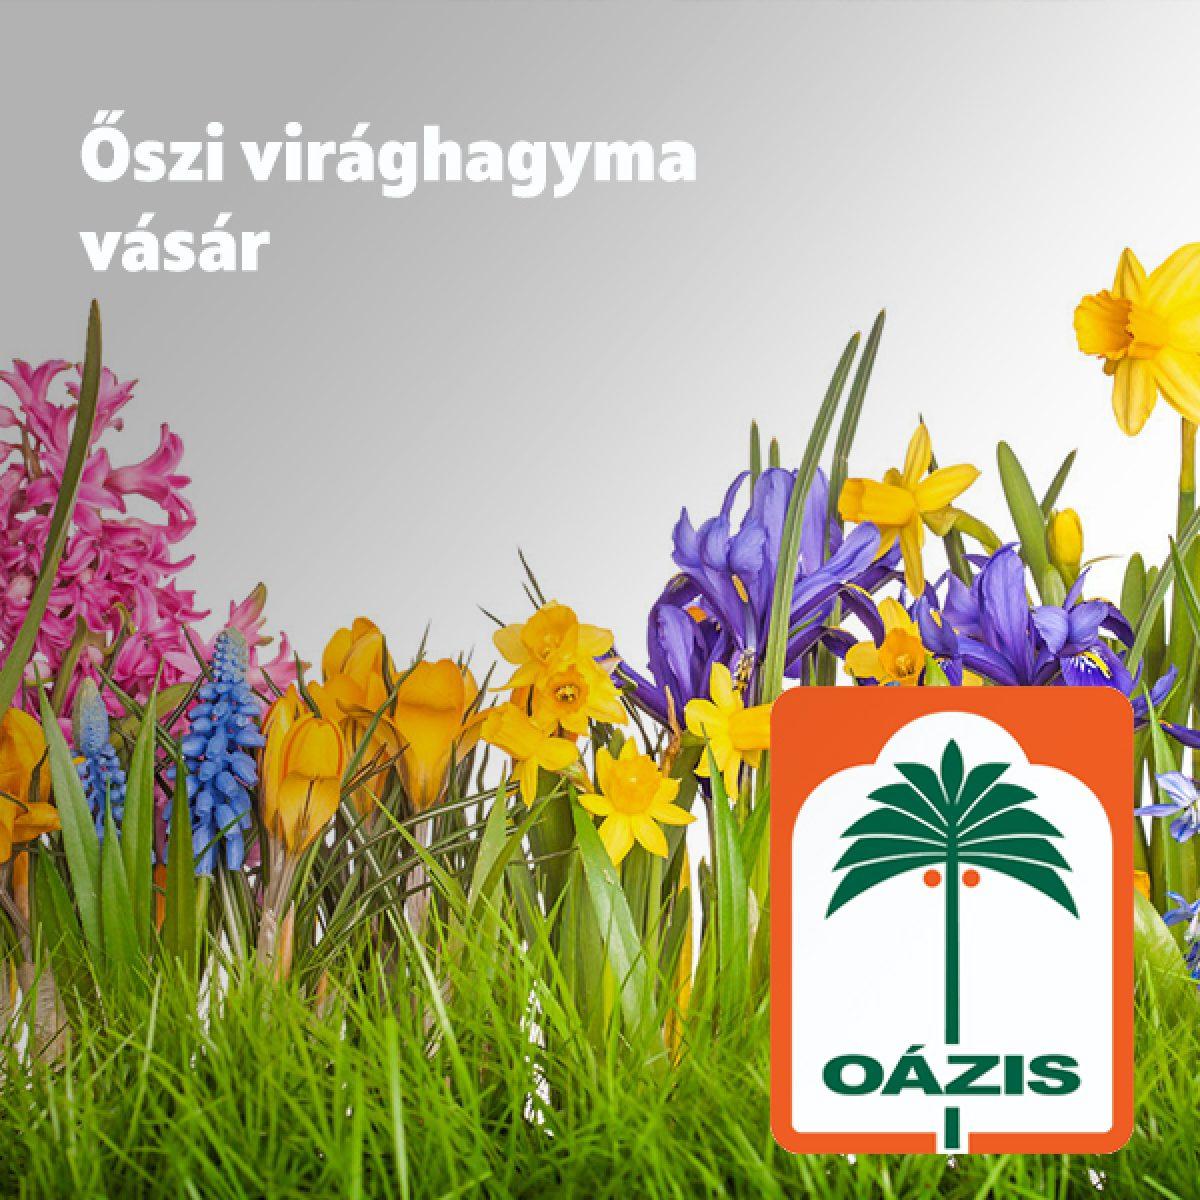 oazis_akcio_05